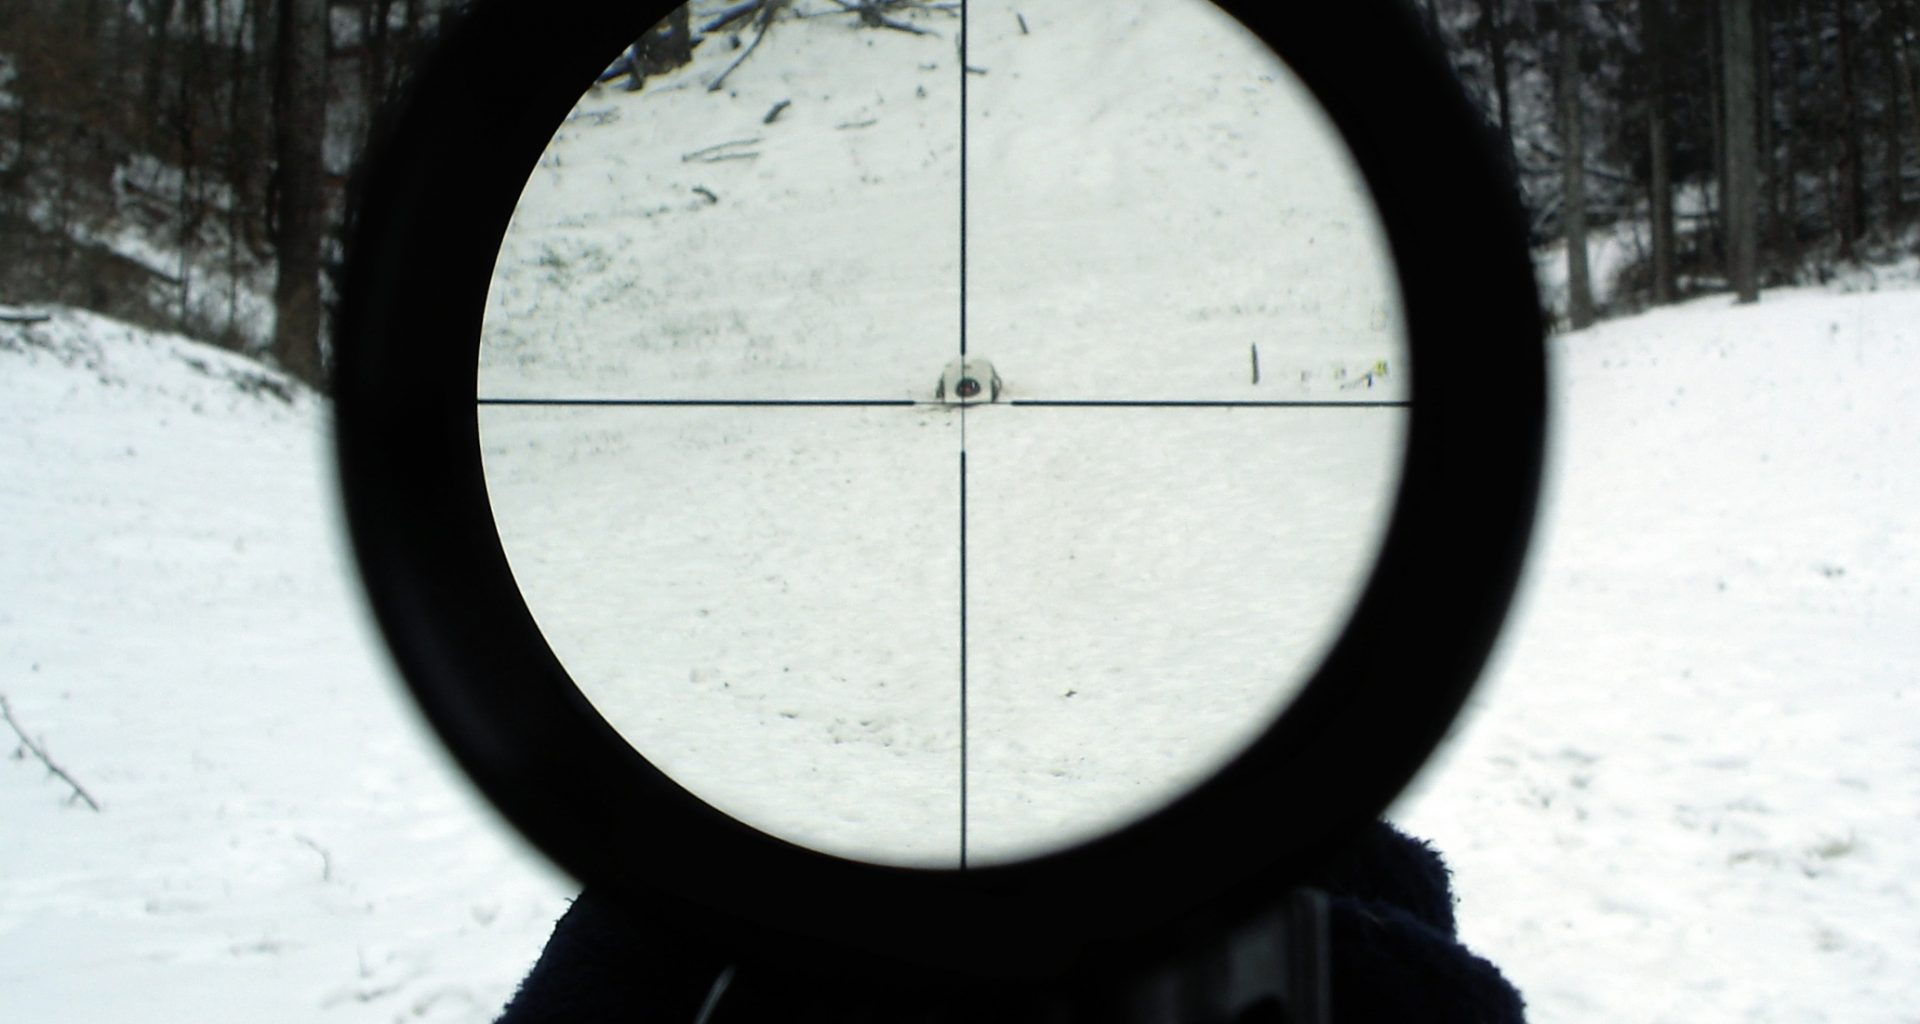 View through telescopic sight (sniper scope)